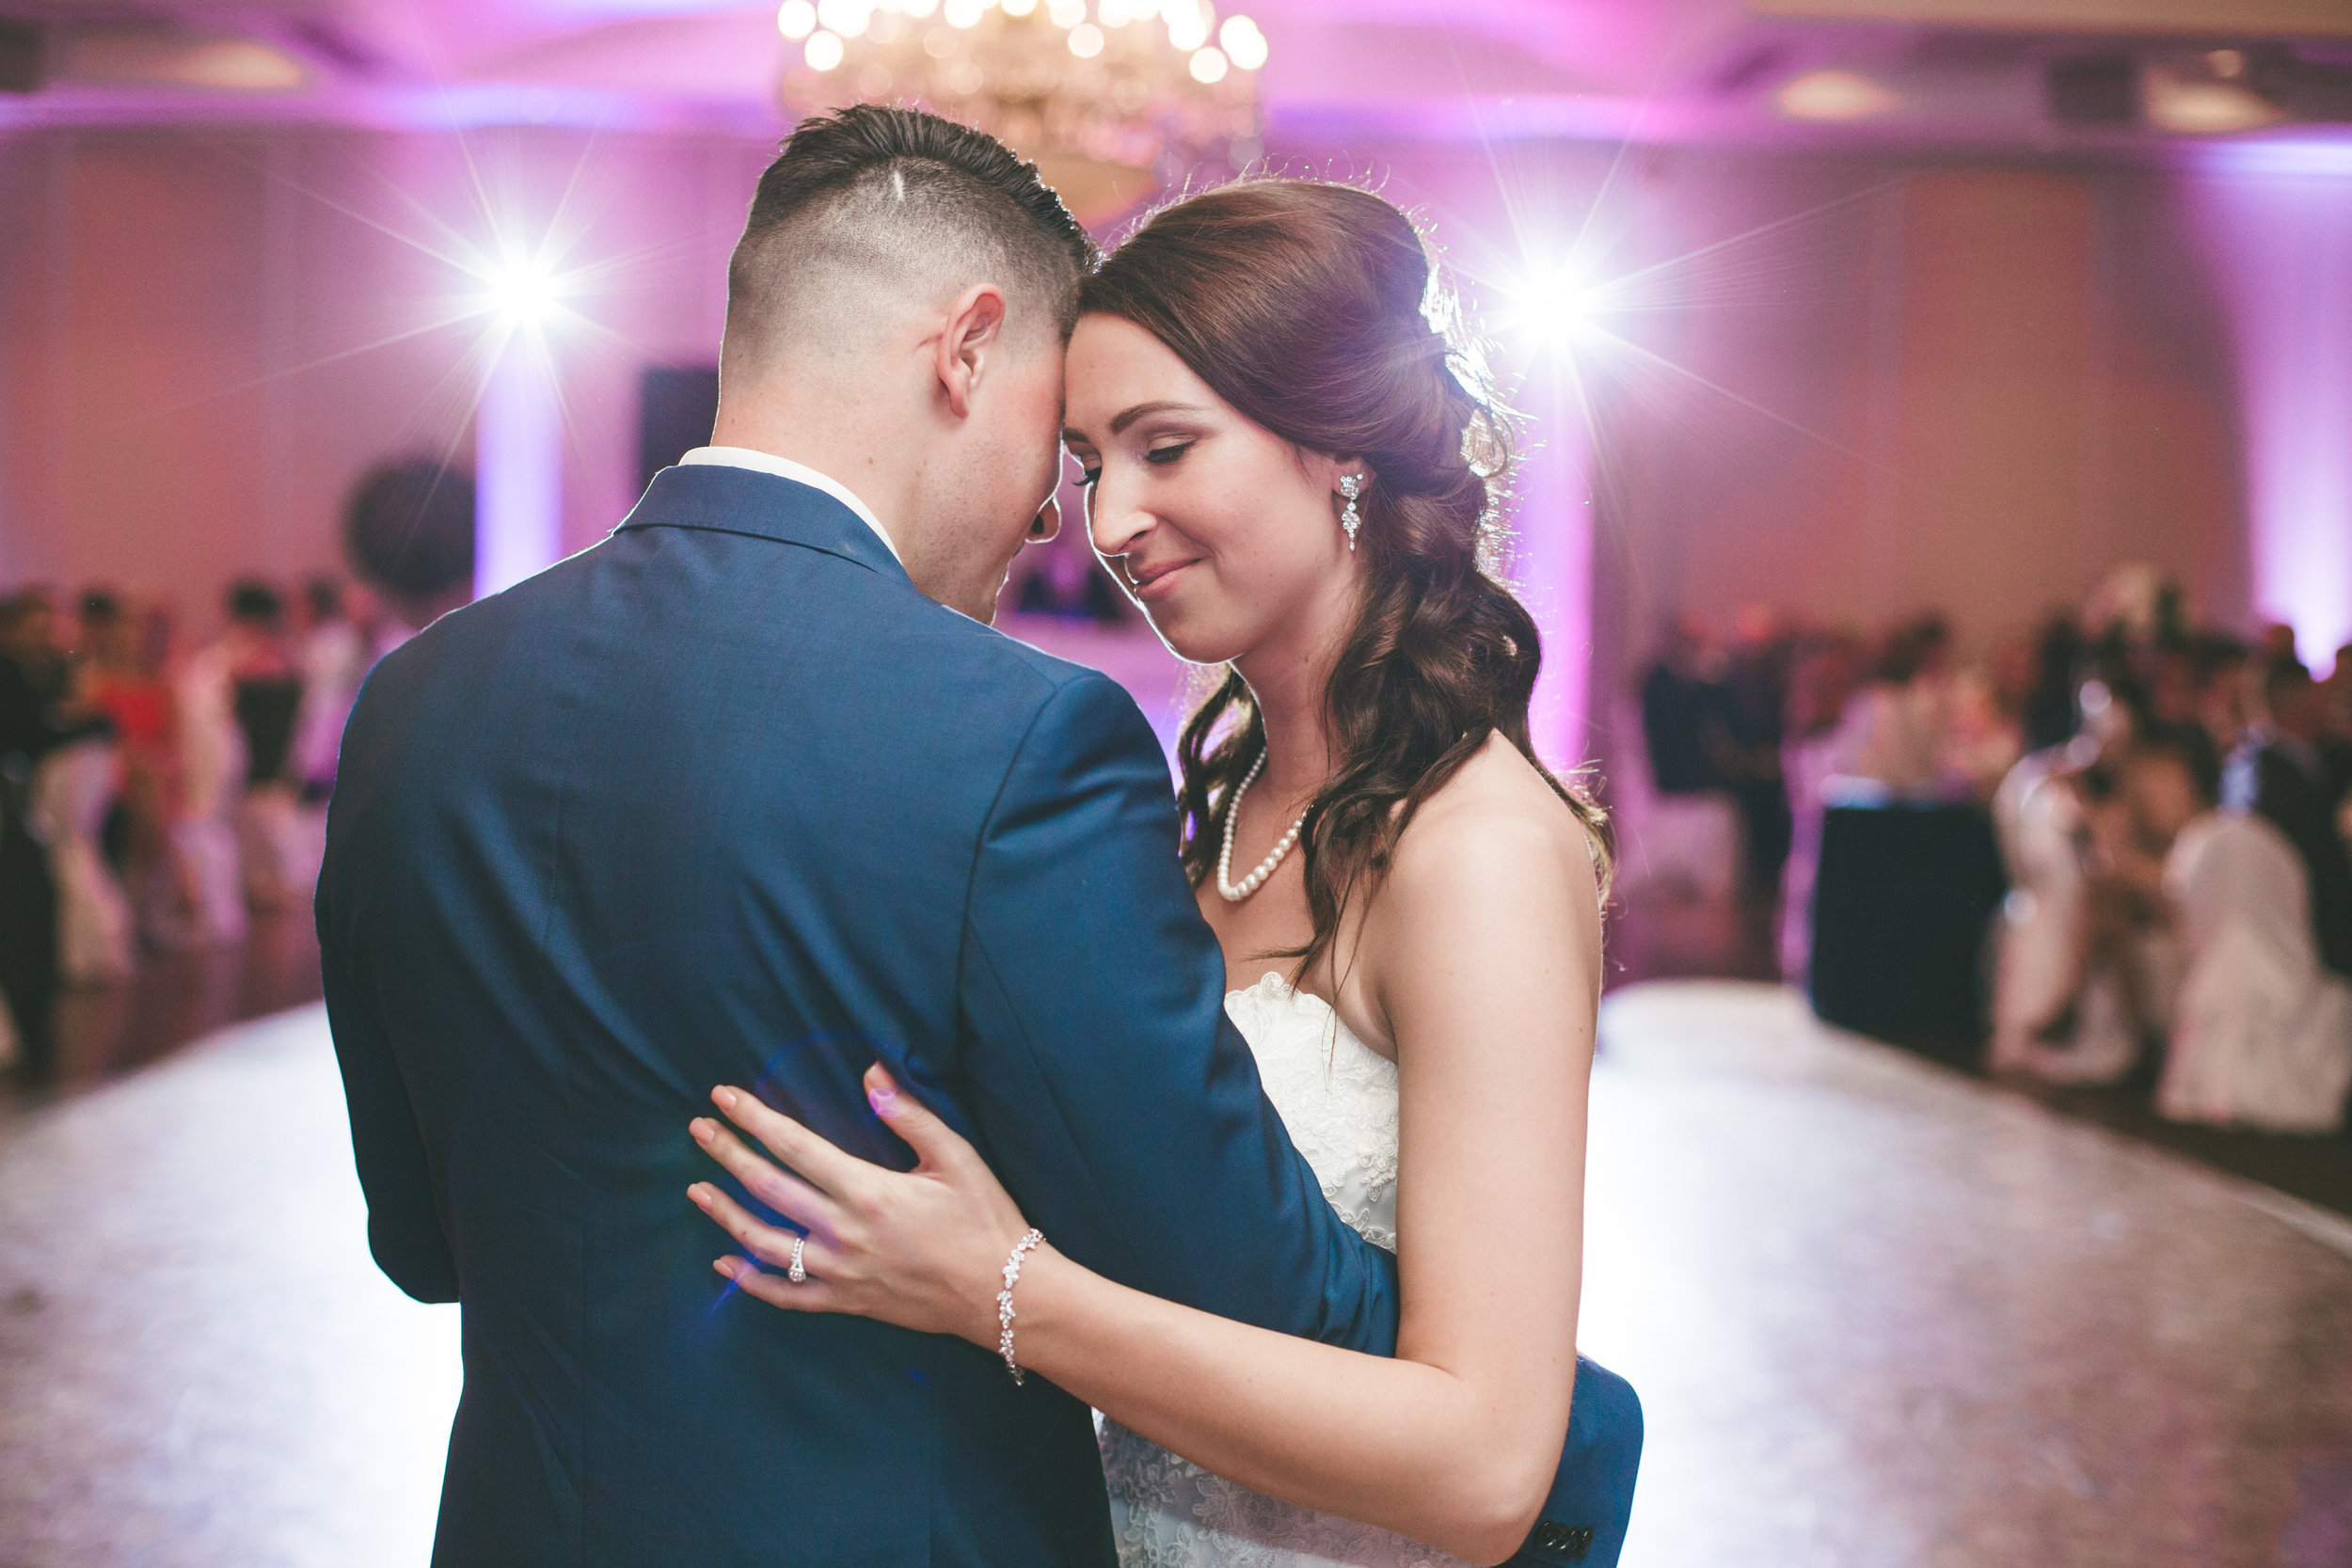 ashley___dario_wedding___lifesreel_danielcaruso___1719.jpg